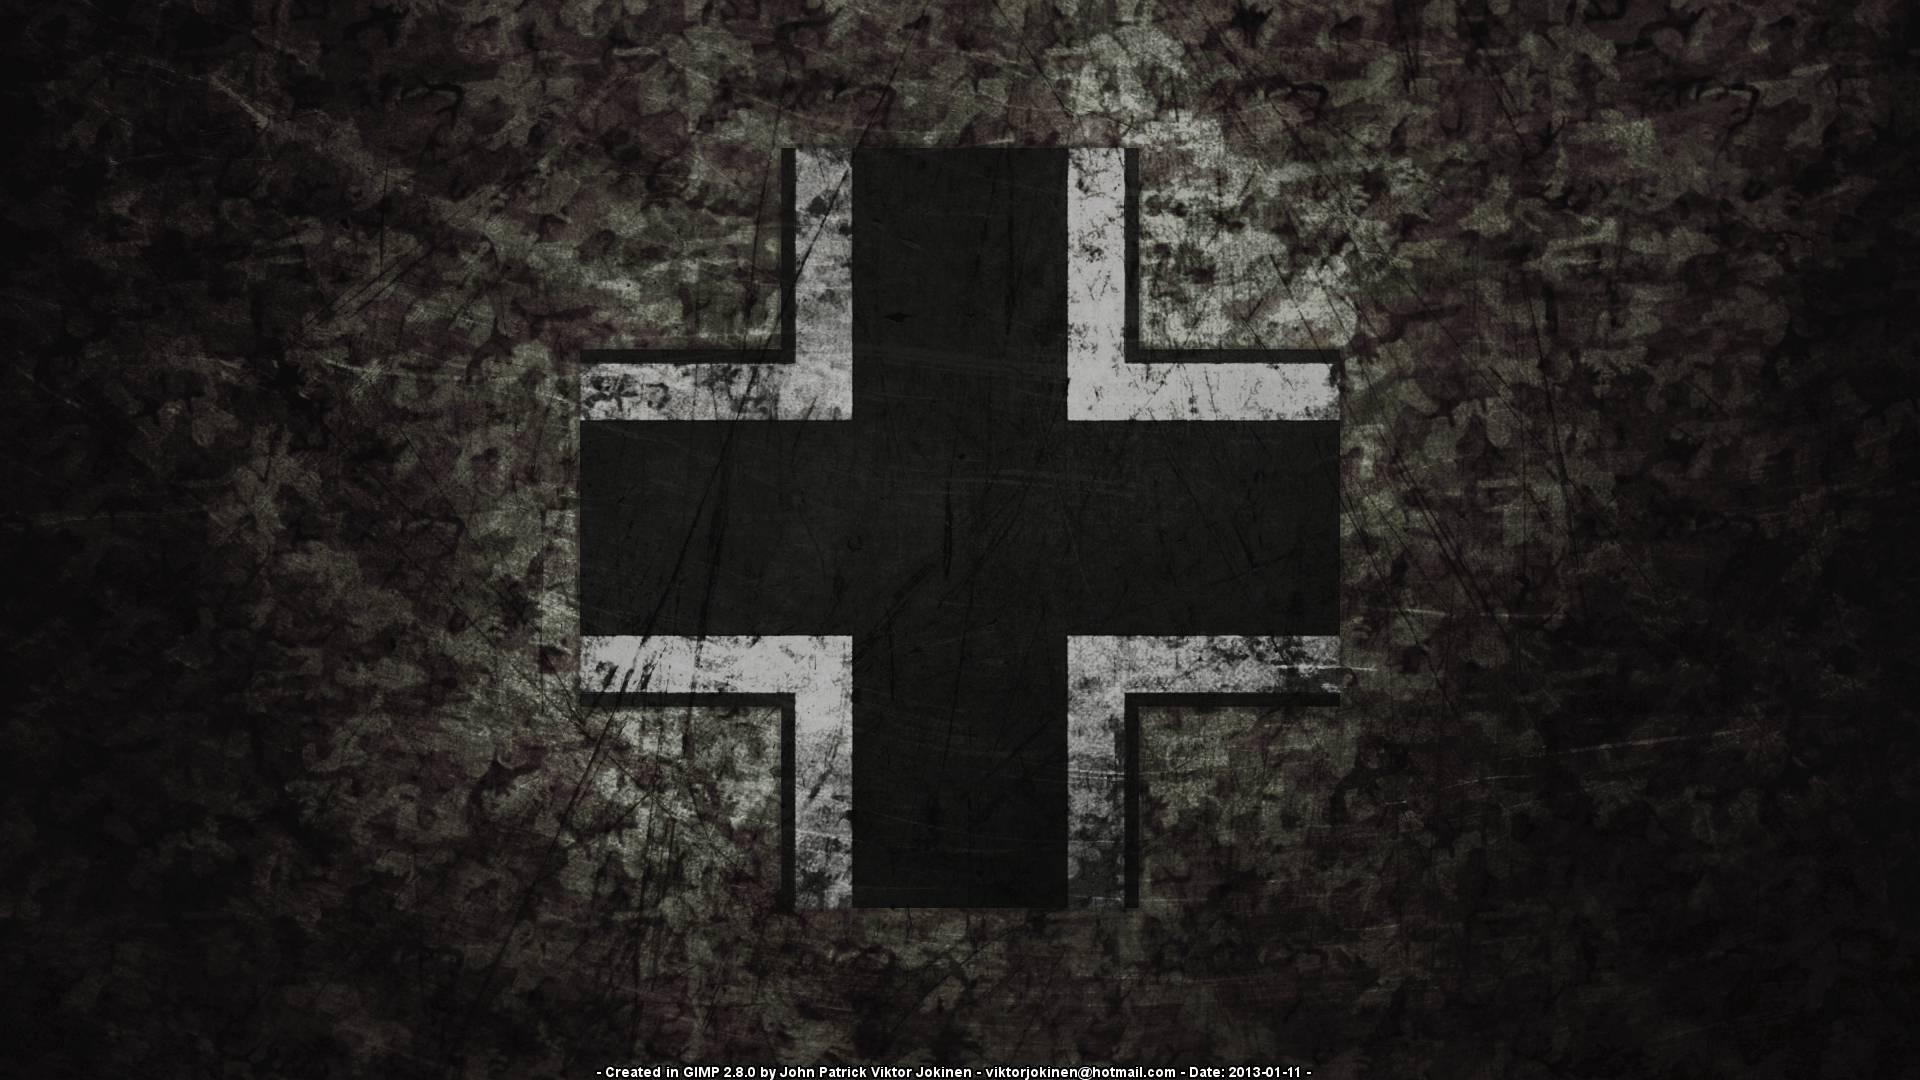 4k Girls Und Panzer Wallpaper Wehrmacht Wallpapers Wallpaper Cave